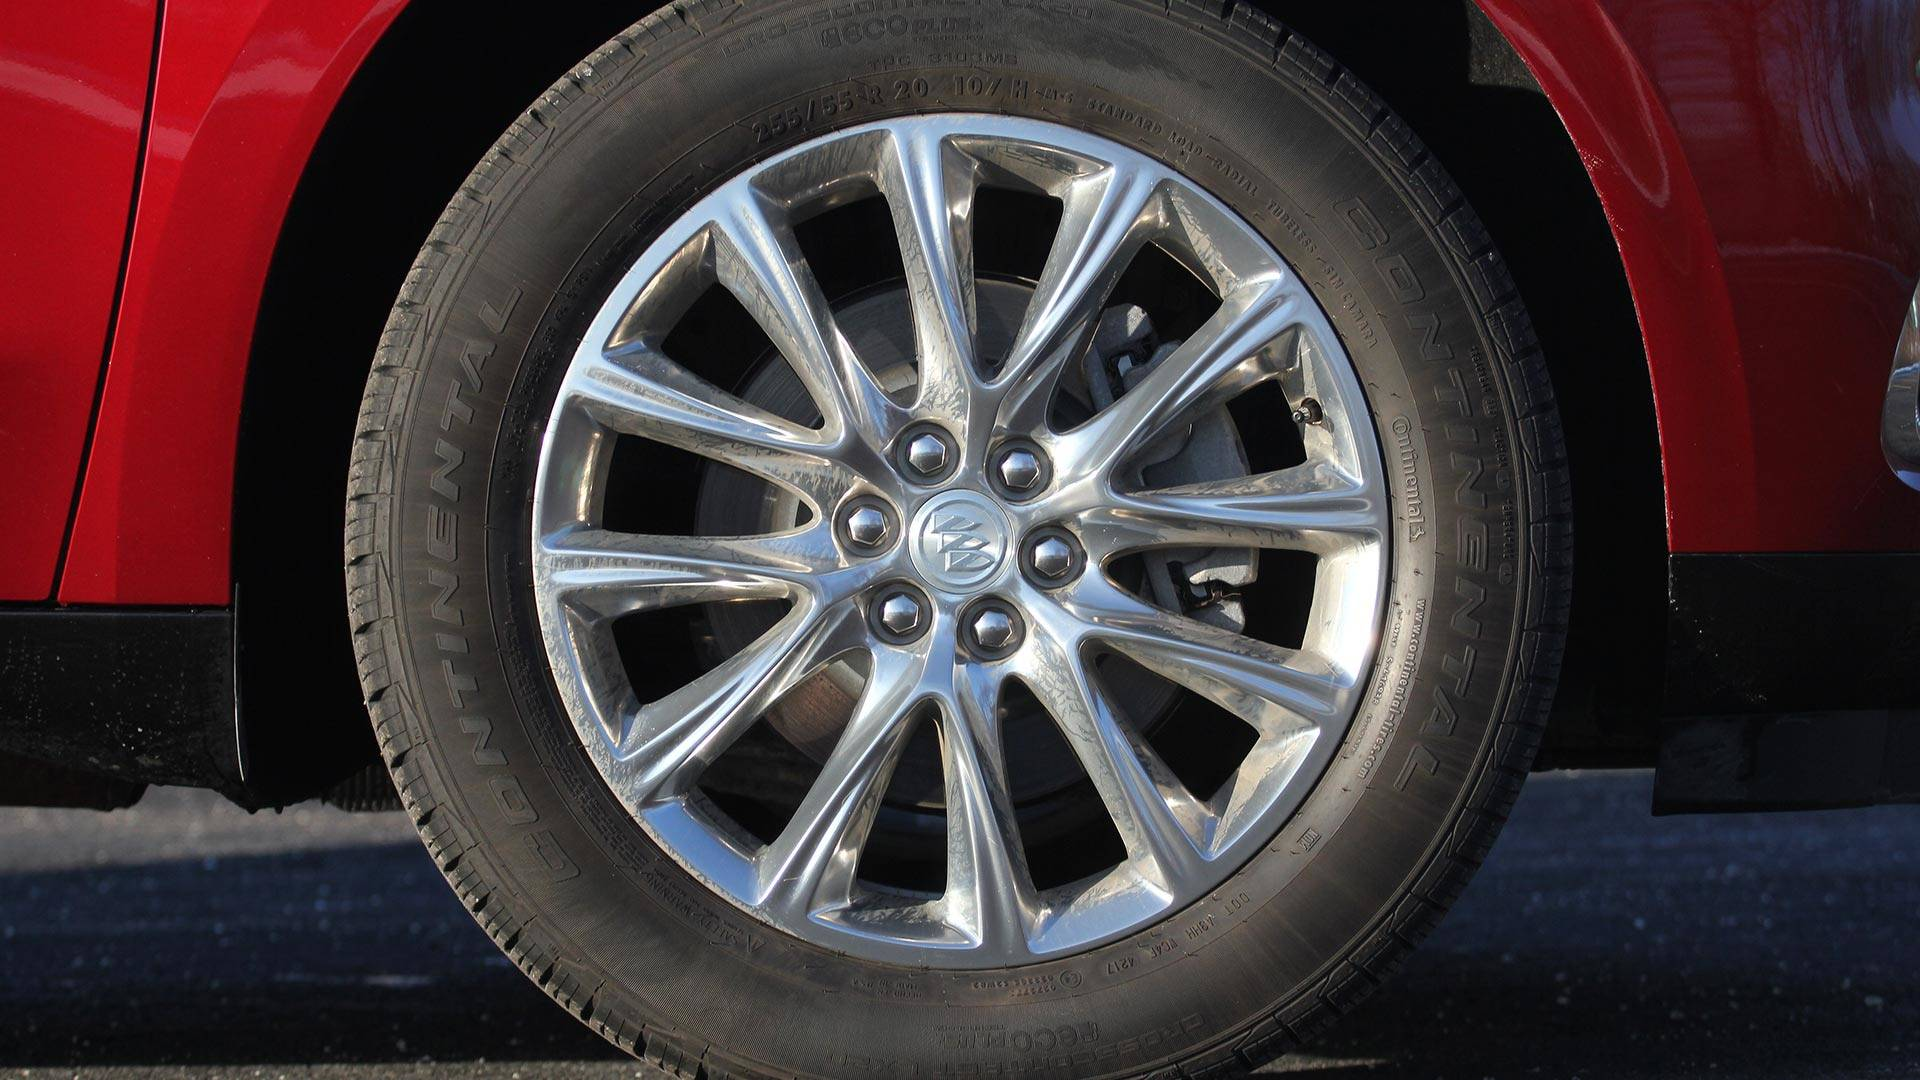 2018 Buick Enclave Review: Tasteful Luxury